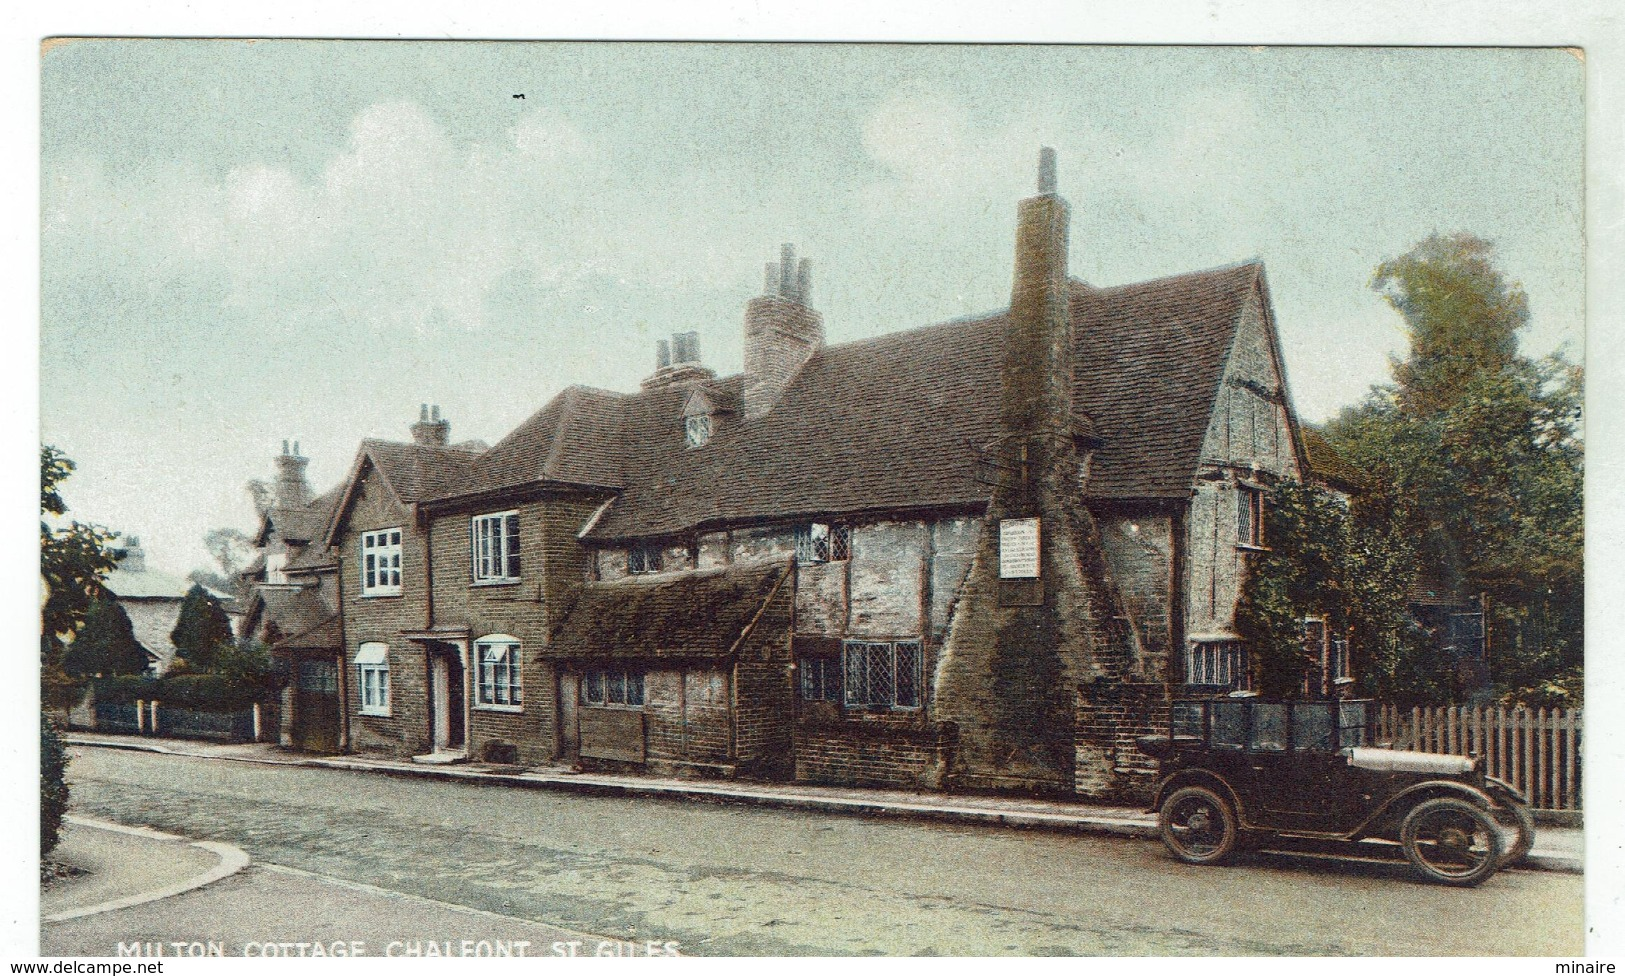 Milton Cottage - CHALFONT ST GILES - Good Condition- 1934 - Buckinghamshire